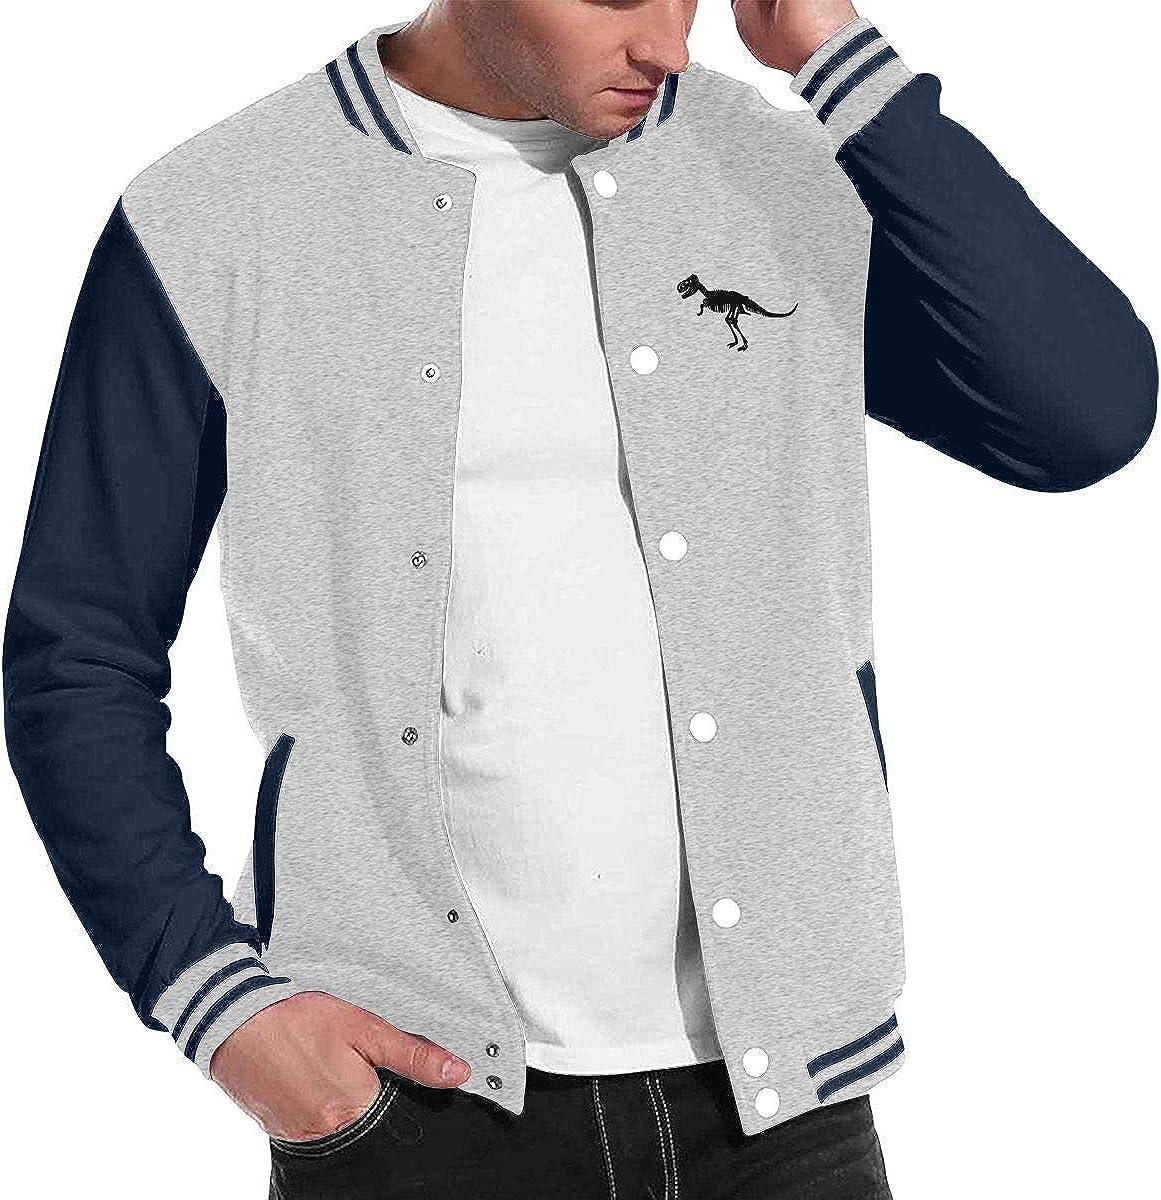 T-Rex Skeleton Mens Fashion Baseball Uniform Jacket Sport Coat